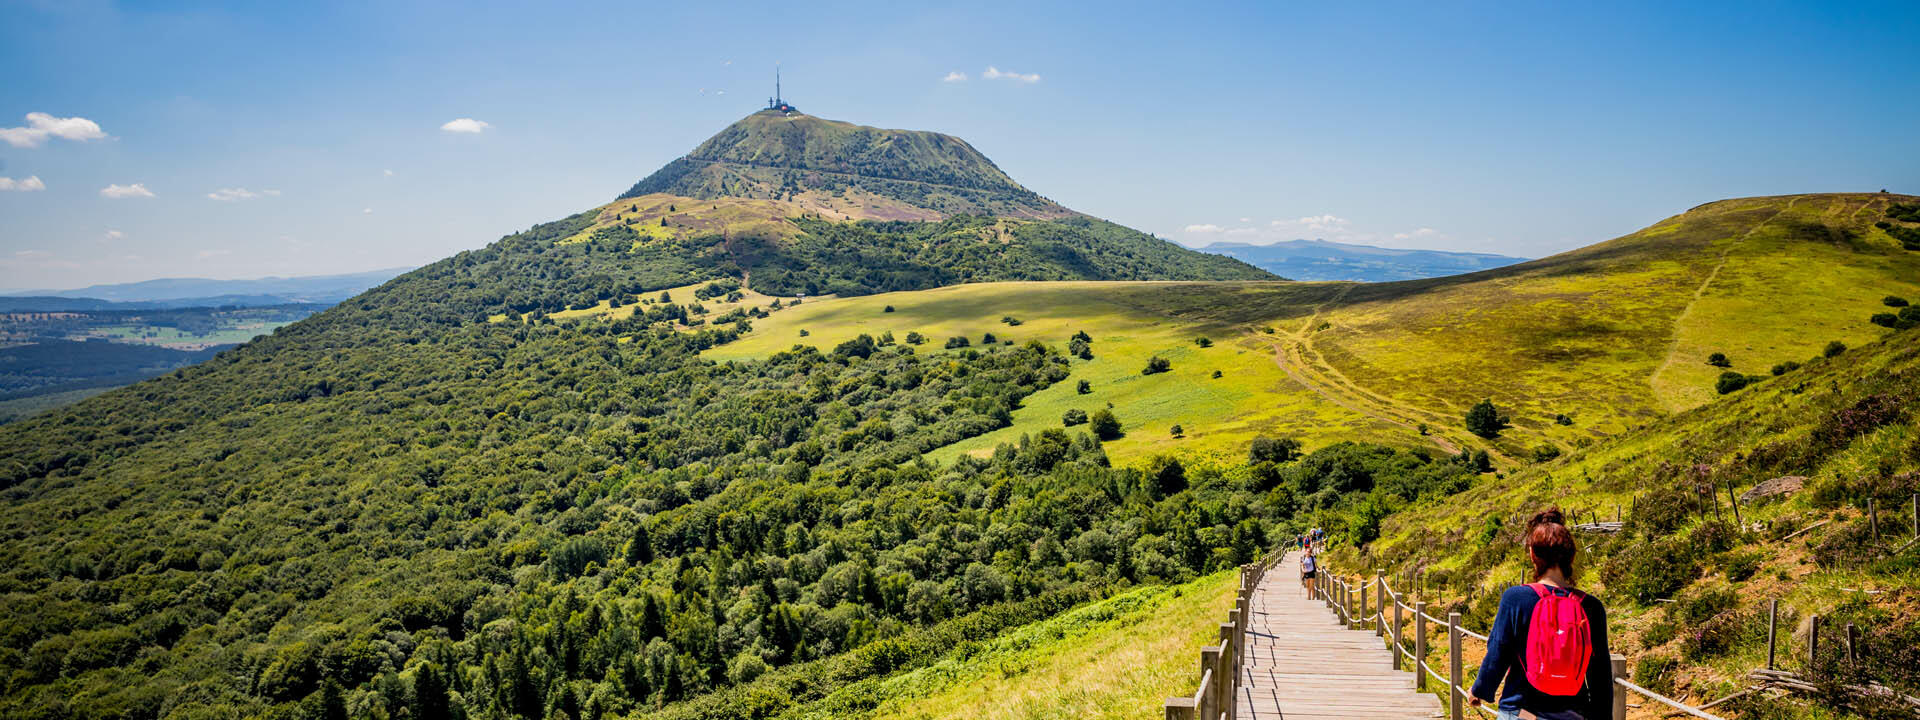 Road trip in Auvergne: 6 days, 6 towns